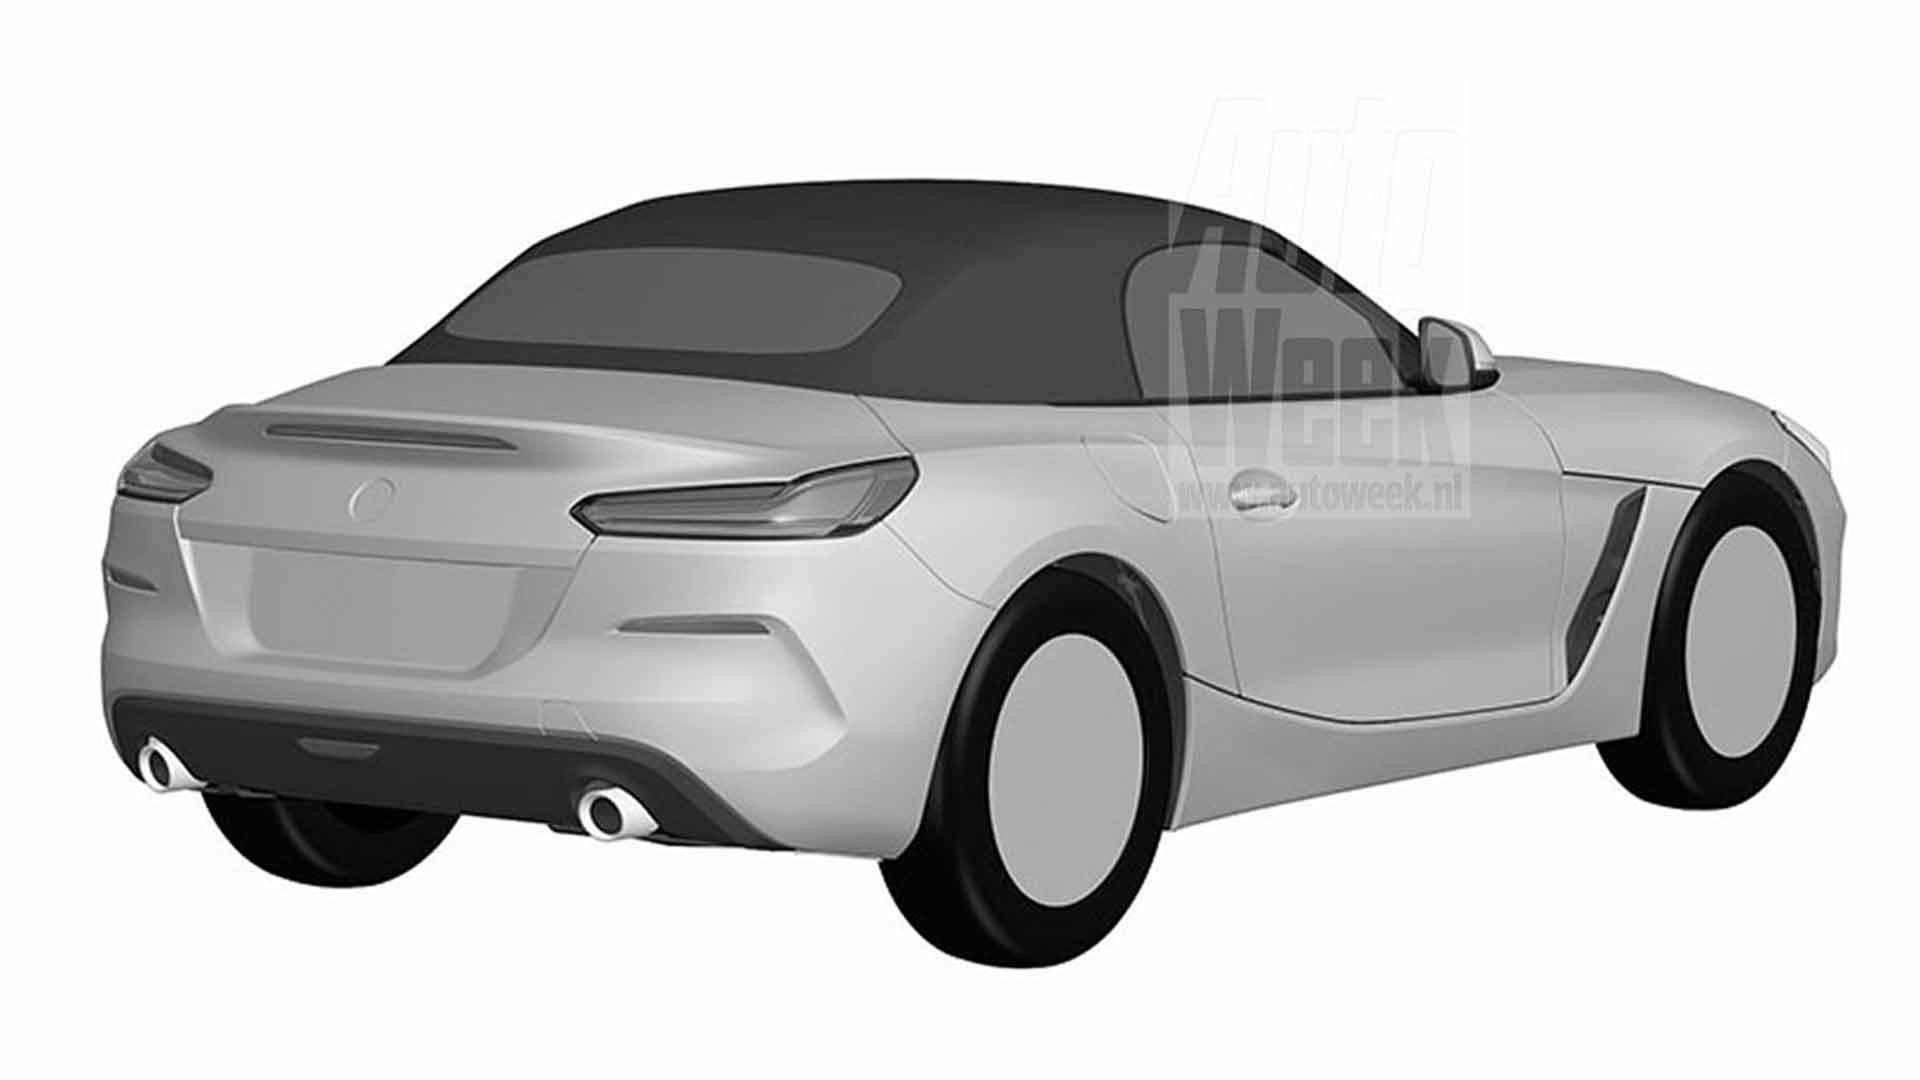 BMW Z4 Design Registration sketches (5)